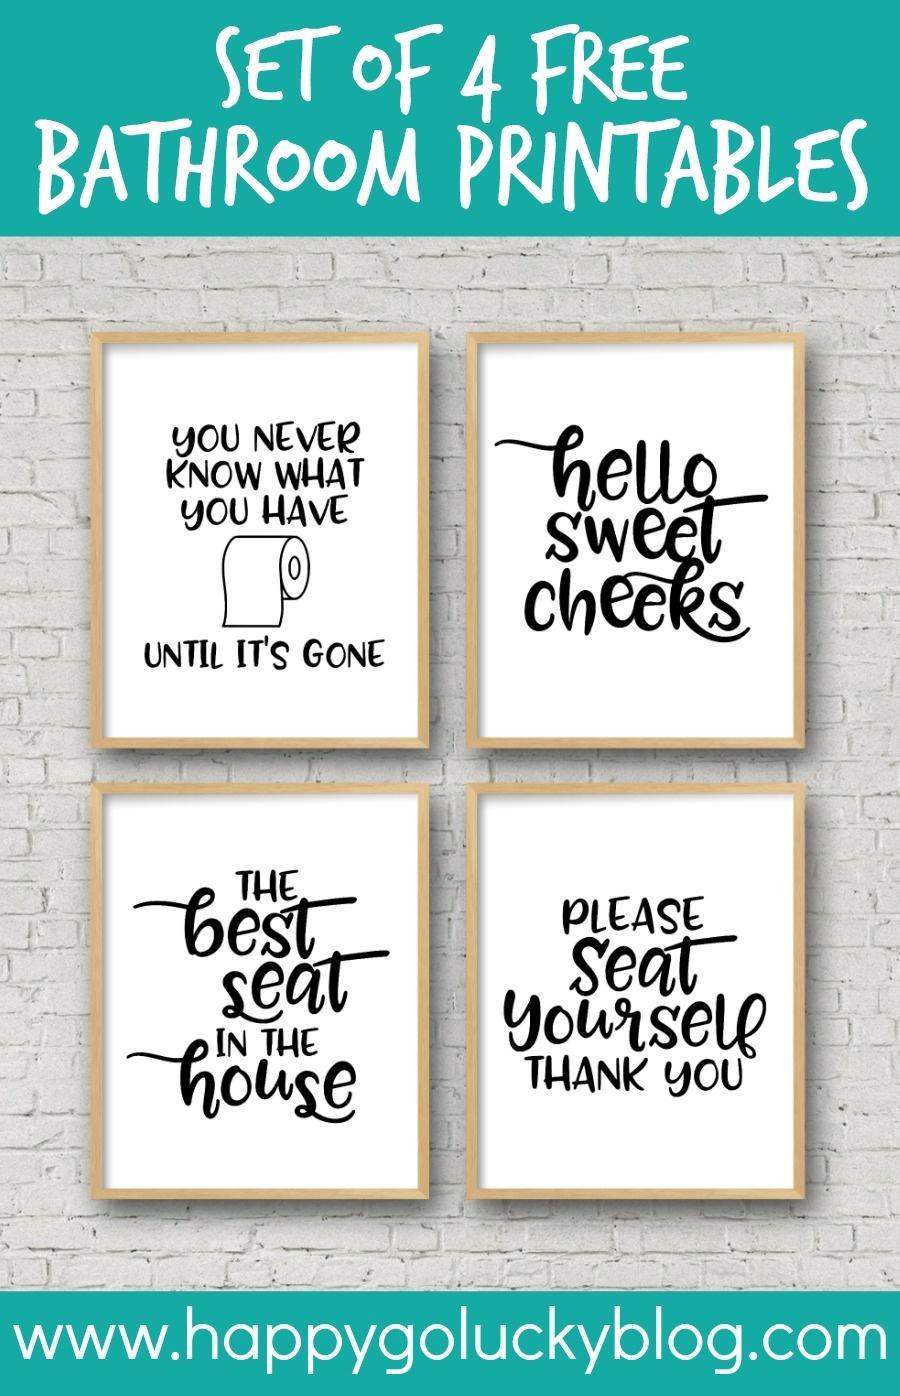 Set Of 4 Printable Bathroom Signs - Happy-Go-Lucky - Free Bathroom Printables